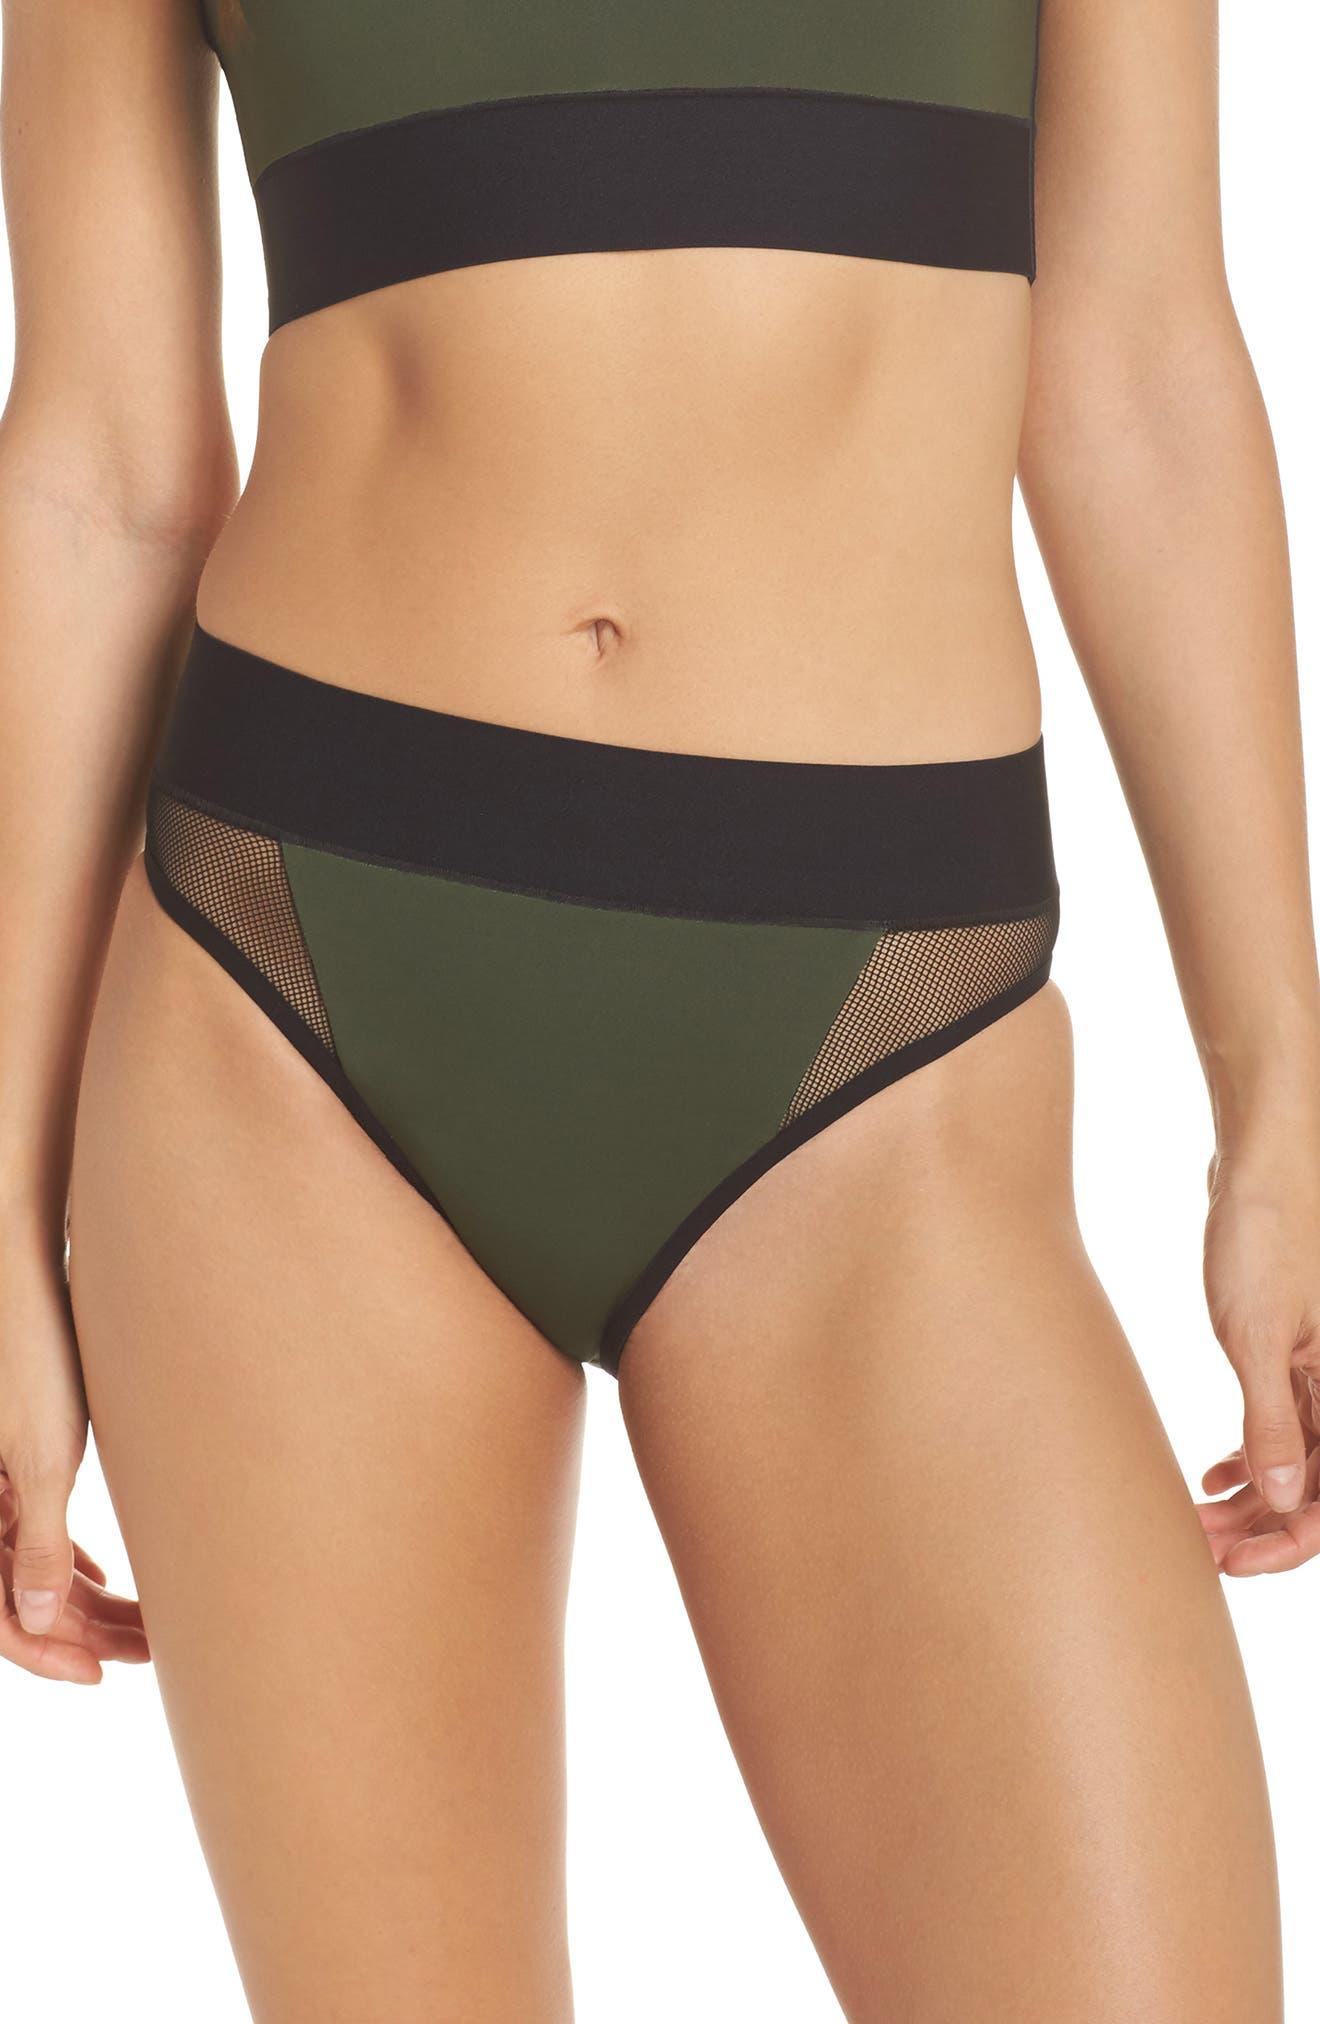 Reef Sport Mesh High-Waist Bikini Bottoms,                         Main,                         color, 302